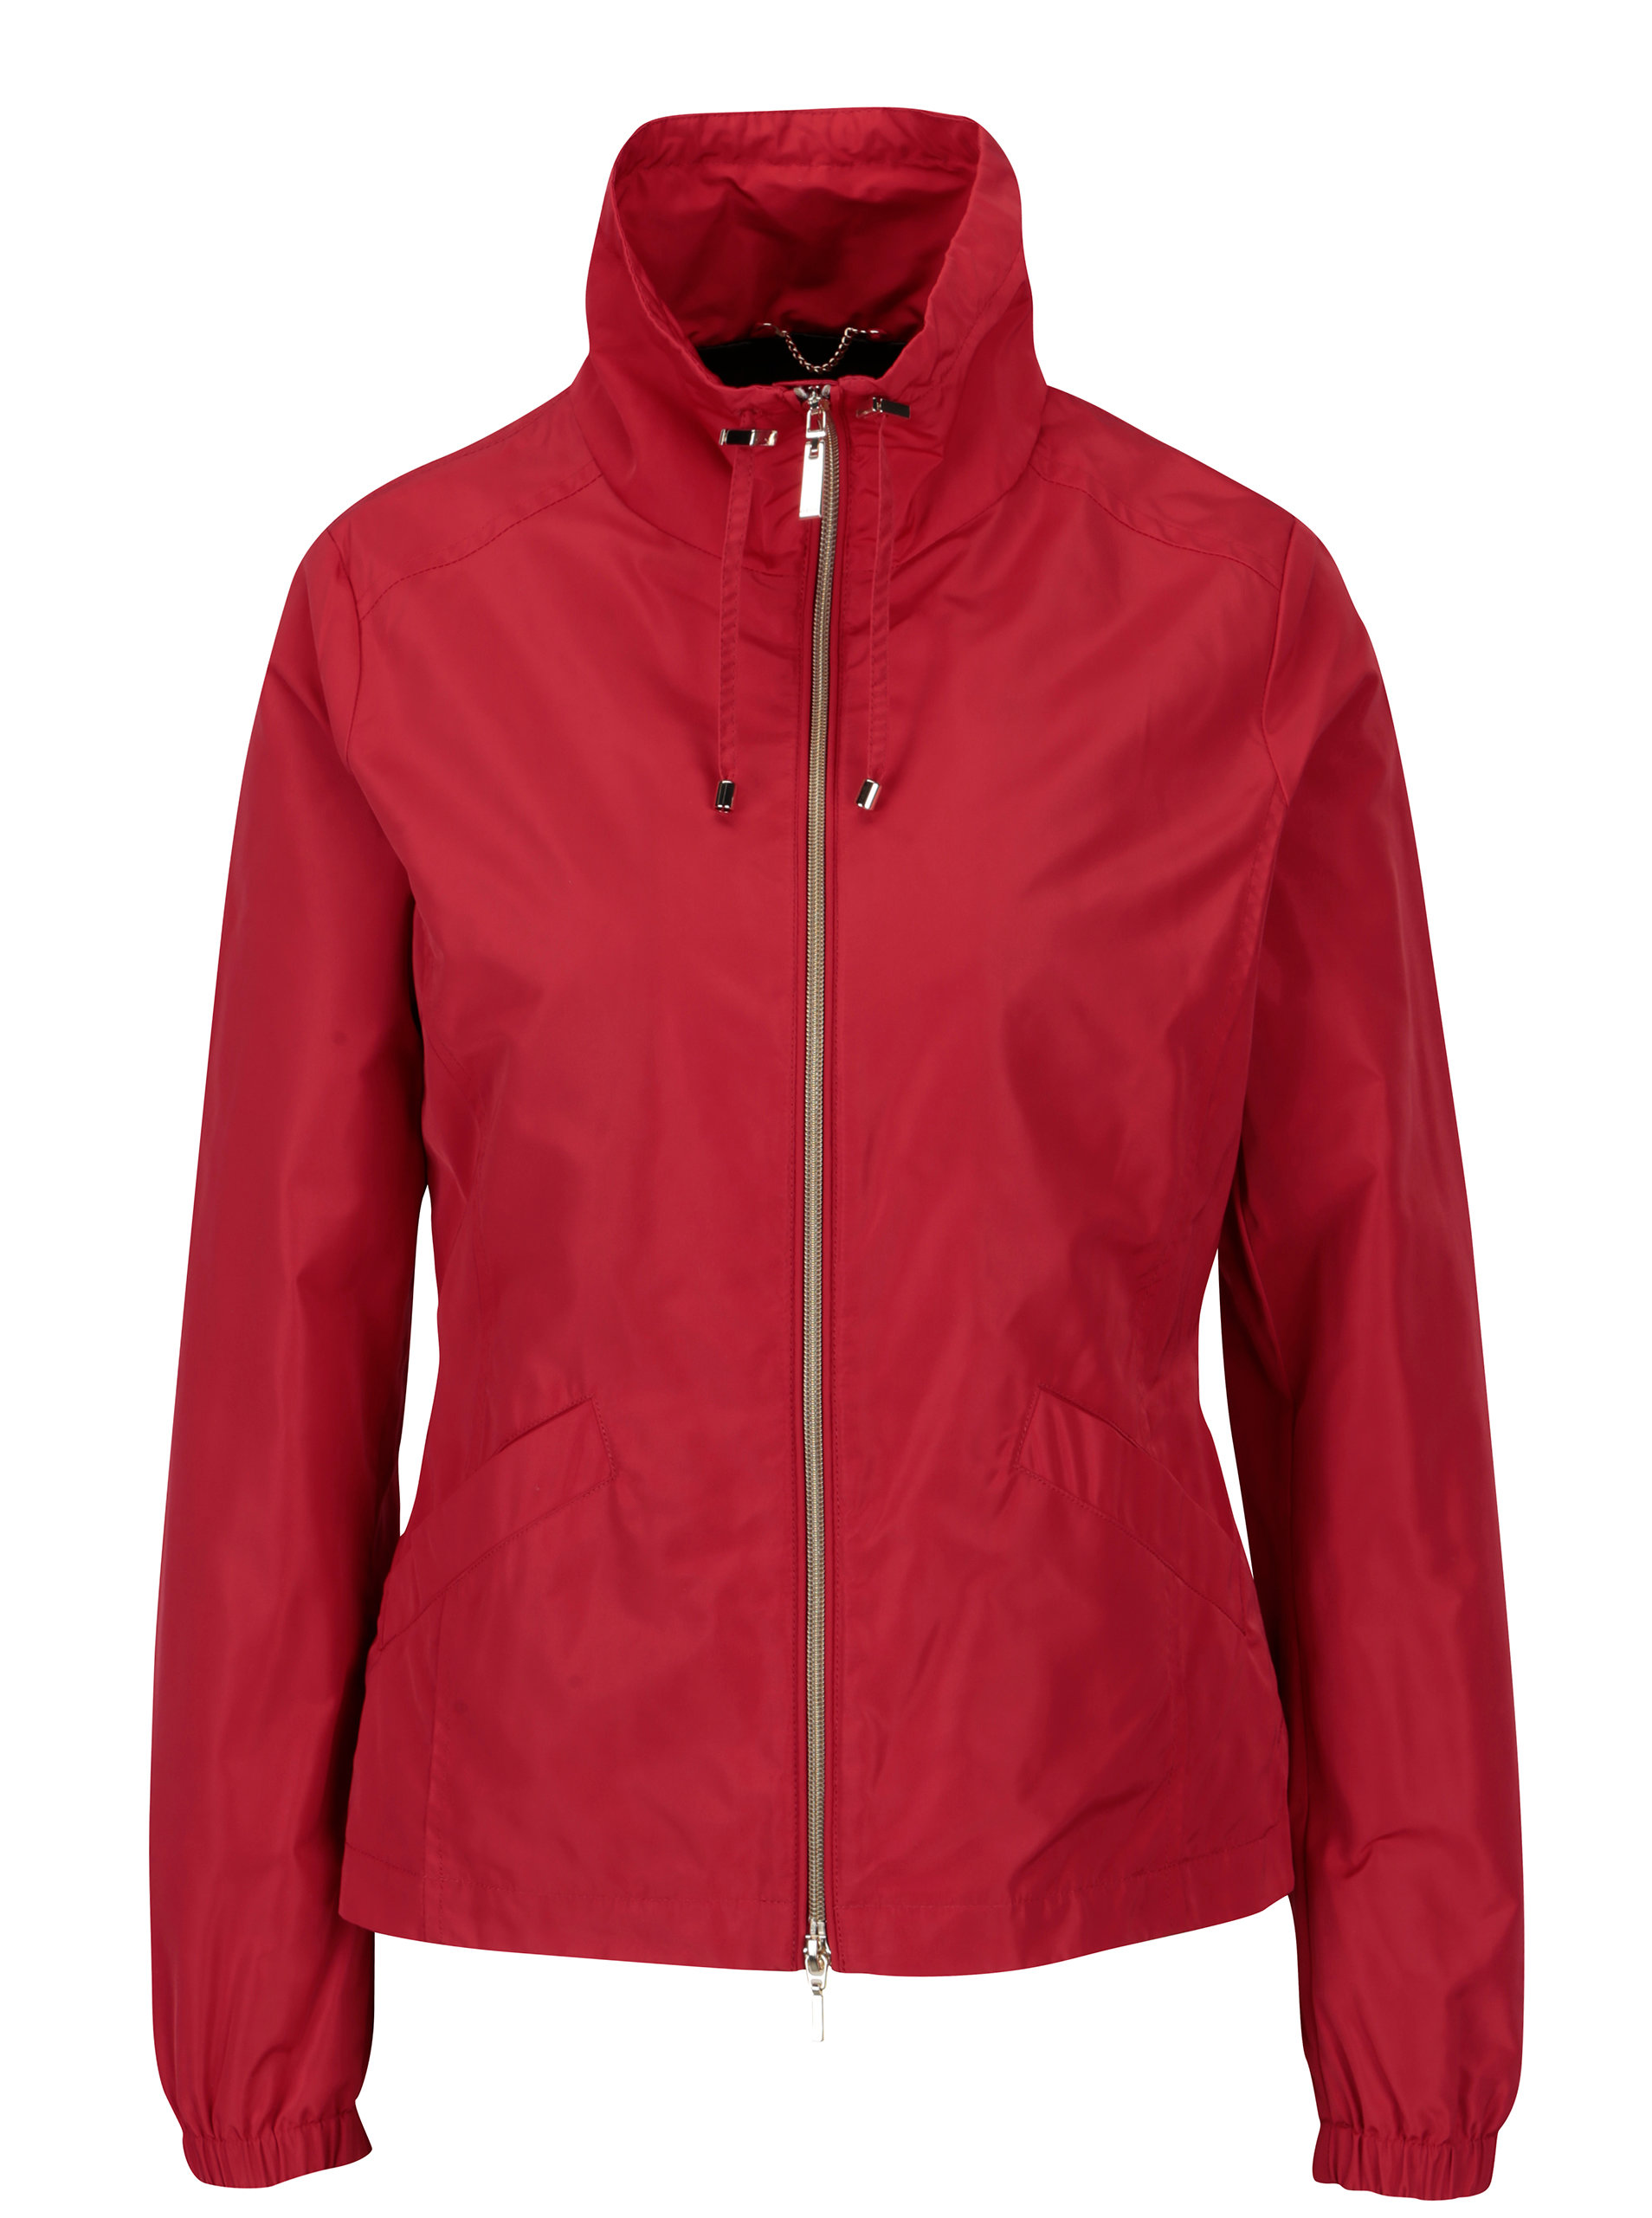 Červená dámska funkčná bunda Geox ... 47be2152389